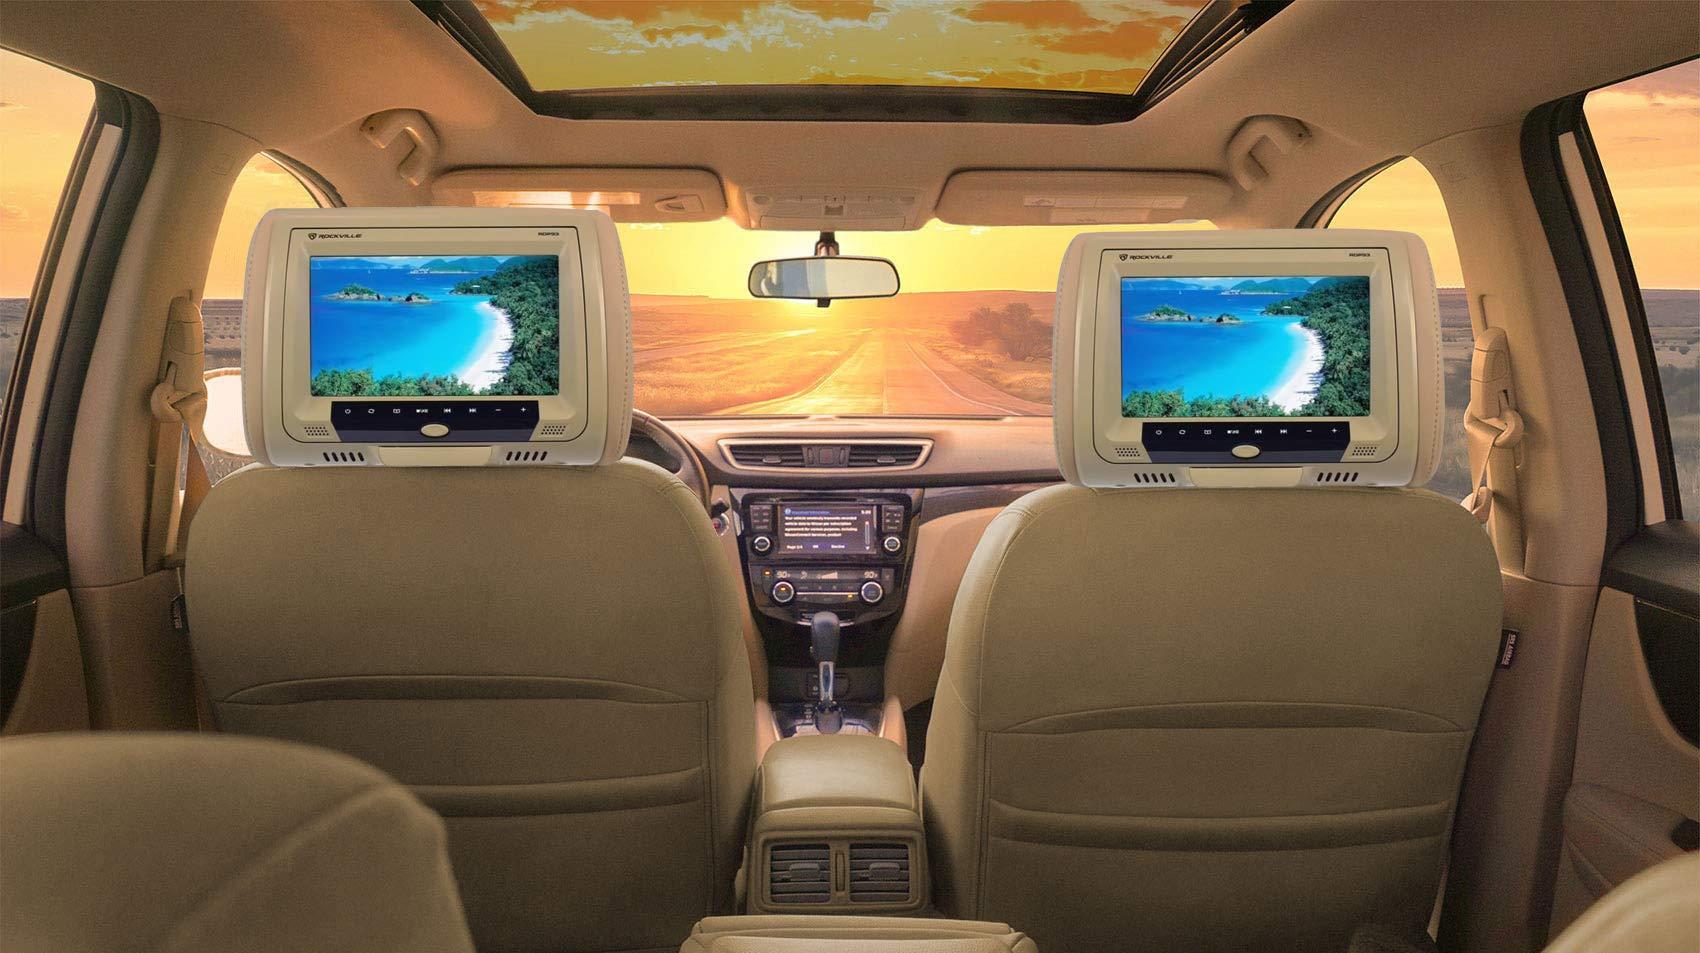 Rockville New 9'' Beige Car DVD/USB/HDMI Headrest Monitors+Video Games (RDP931-BG) by Rockville